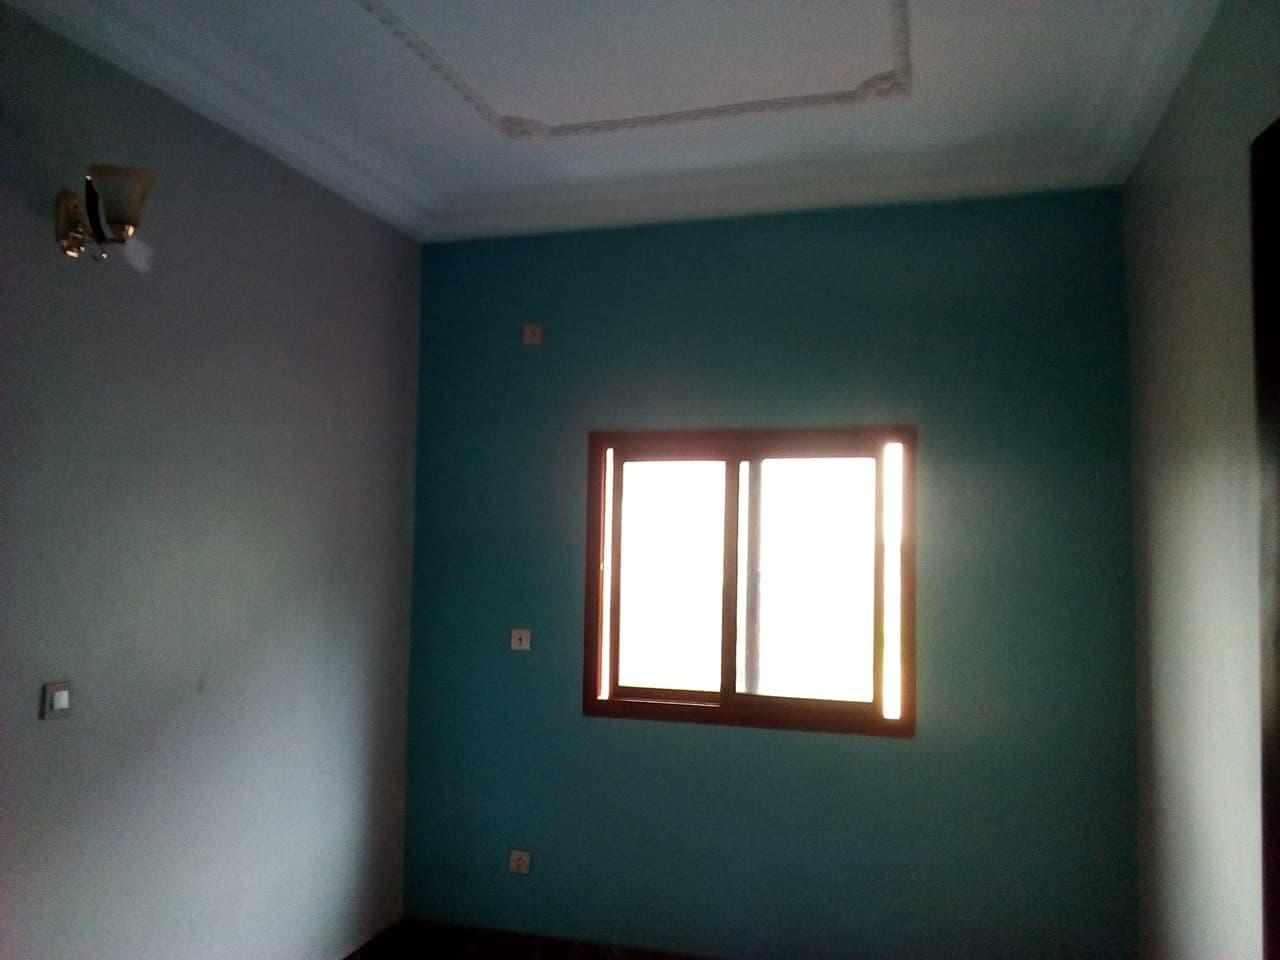 Apartment to rent - Yaoundé, Mfandena, pas loin de titi garage - 1 living room(s), 2 bedroom(s), 1 bathroom(s) - 200 000 FCFA / month